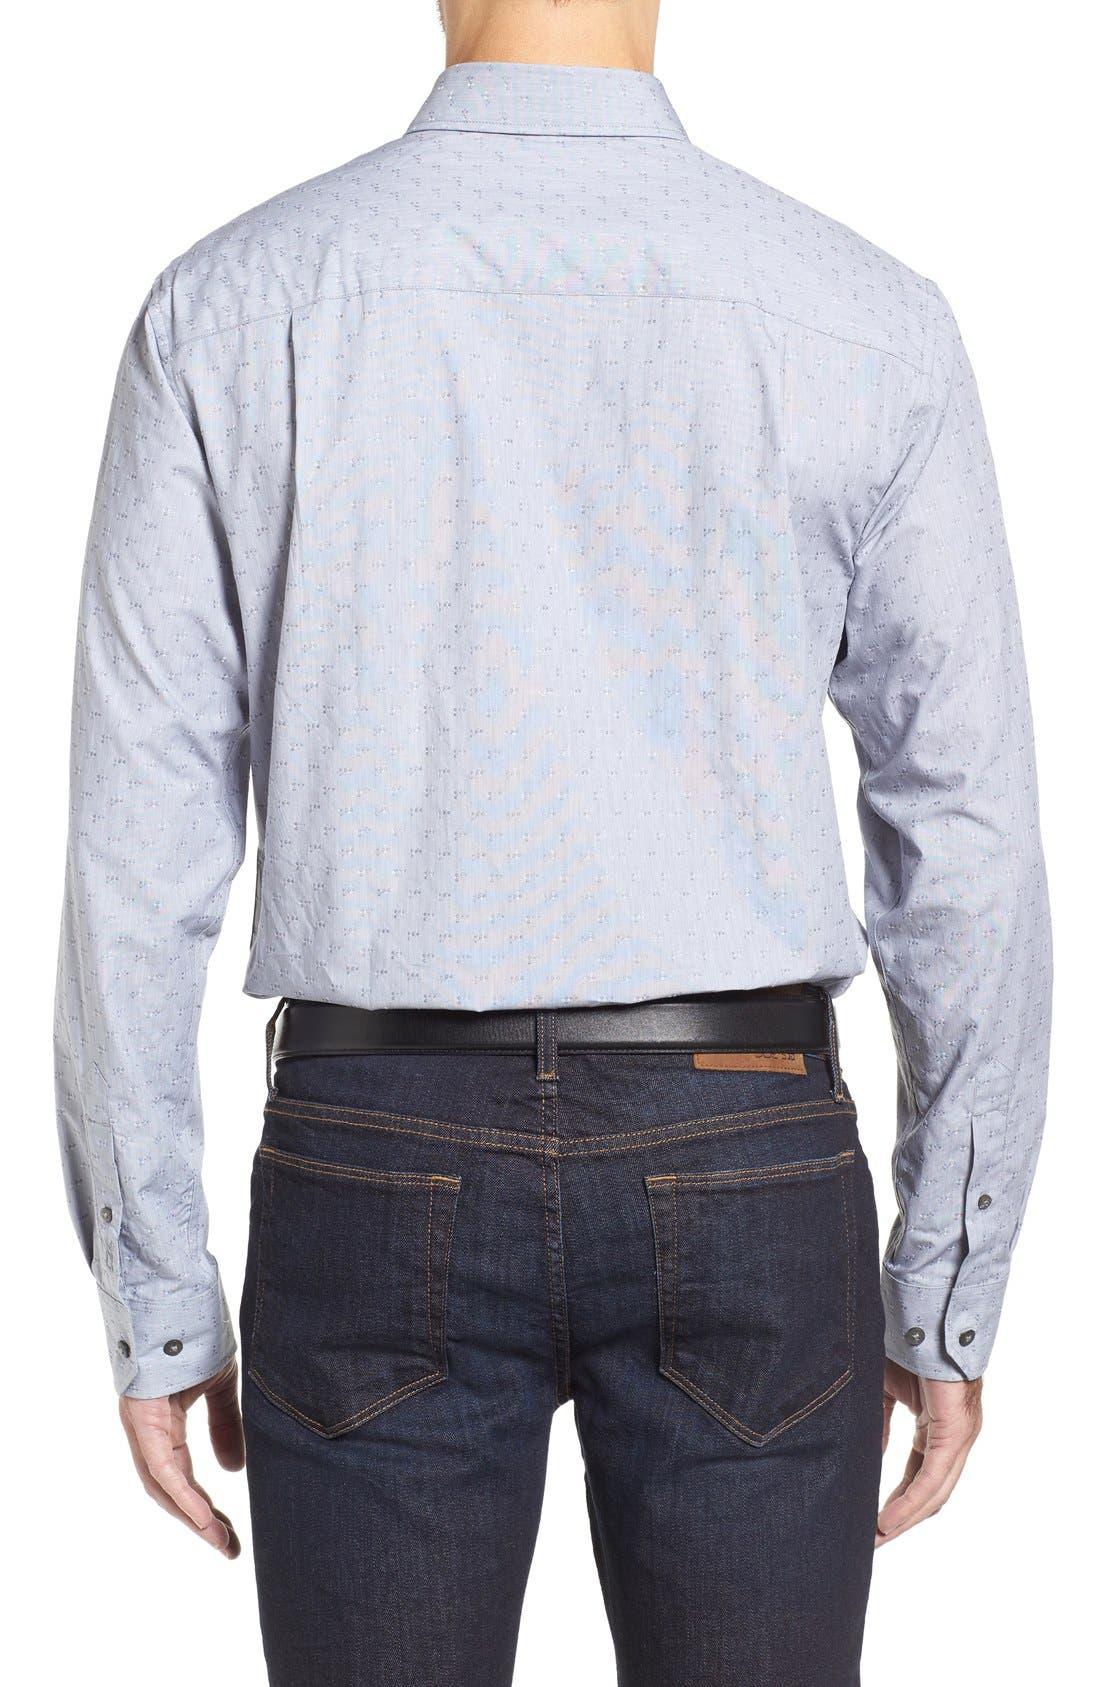 Starboard Jacquard Sport Shirt,                             Alternate thumbnail 3, color,                             Grey/ Multi